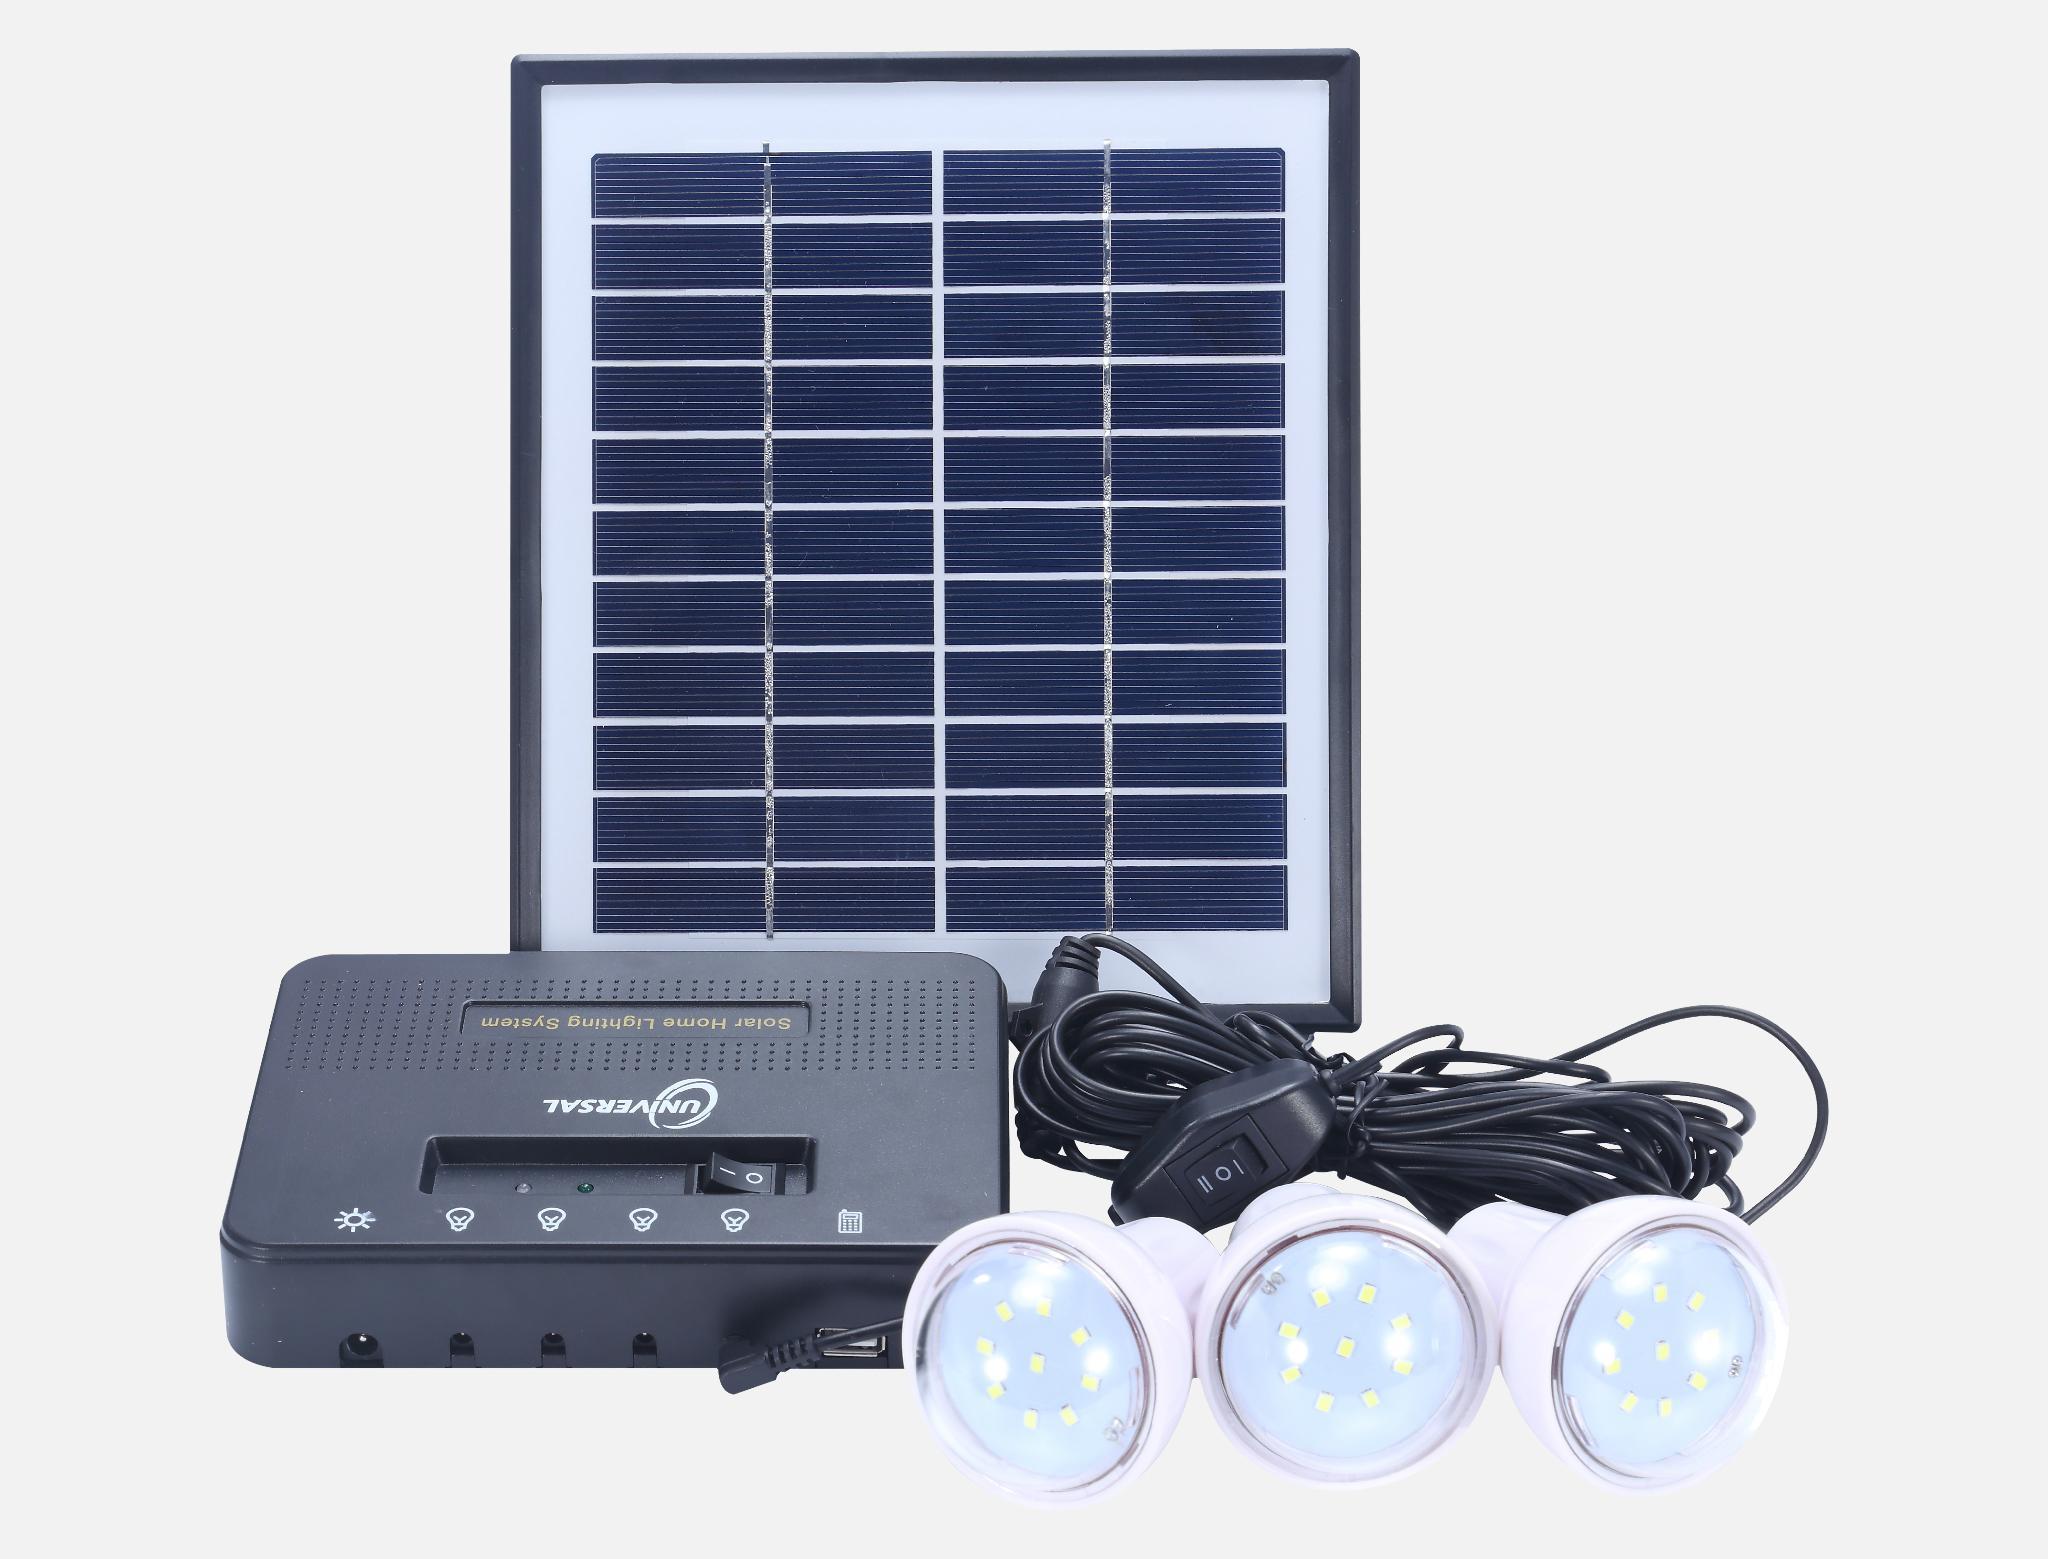 8W Solar Home Lighting Kit - 4 bulbs